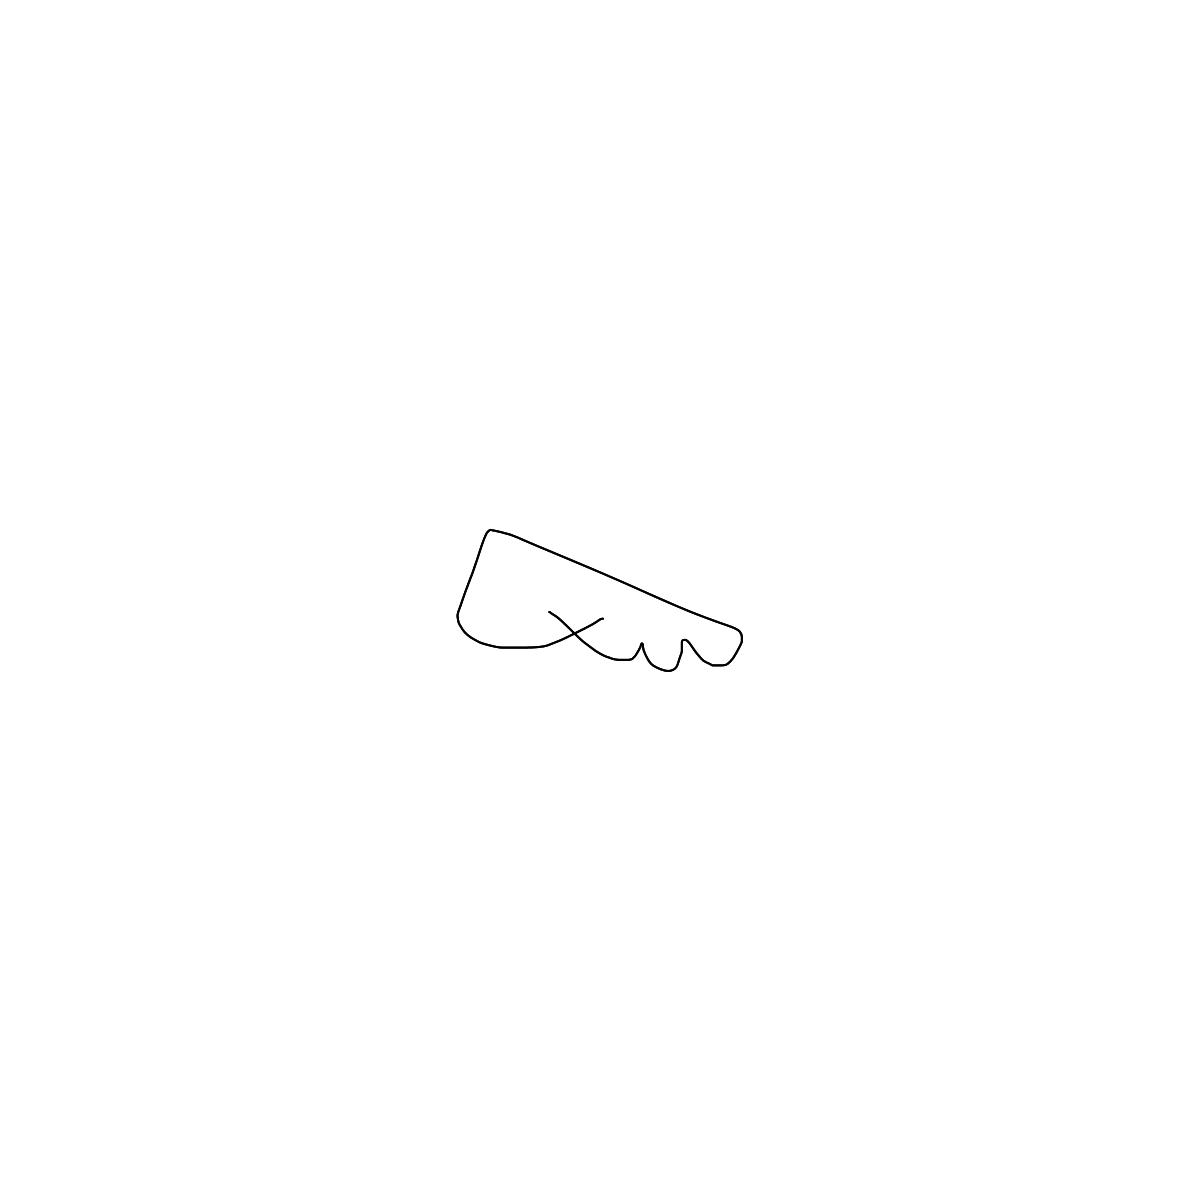 BAAAM drawing#17610 lat:50.0960731506347660lng: 8.7696609497070310